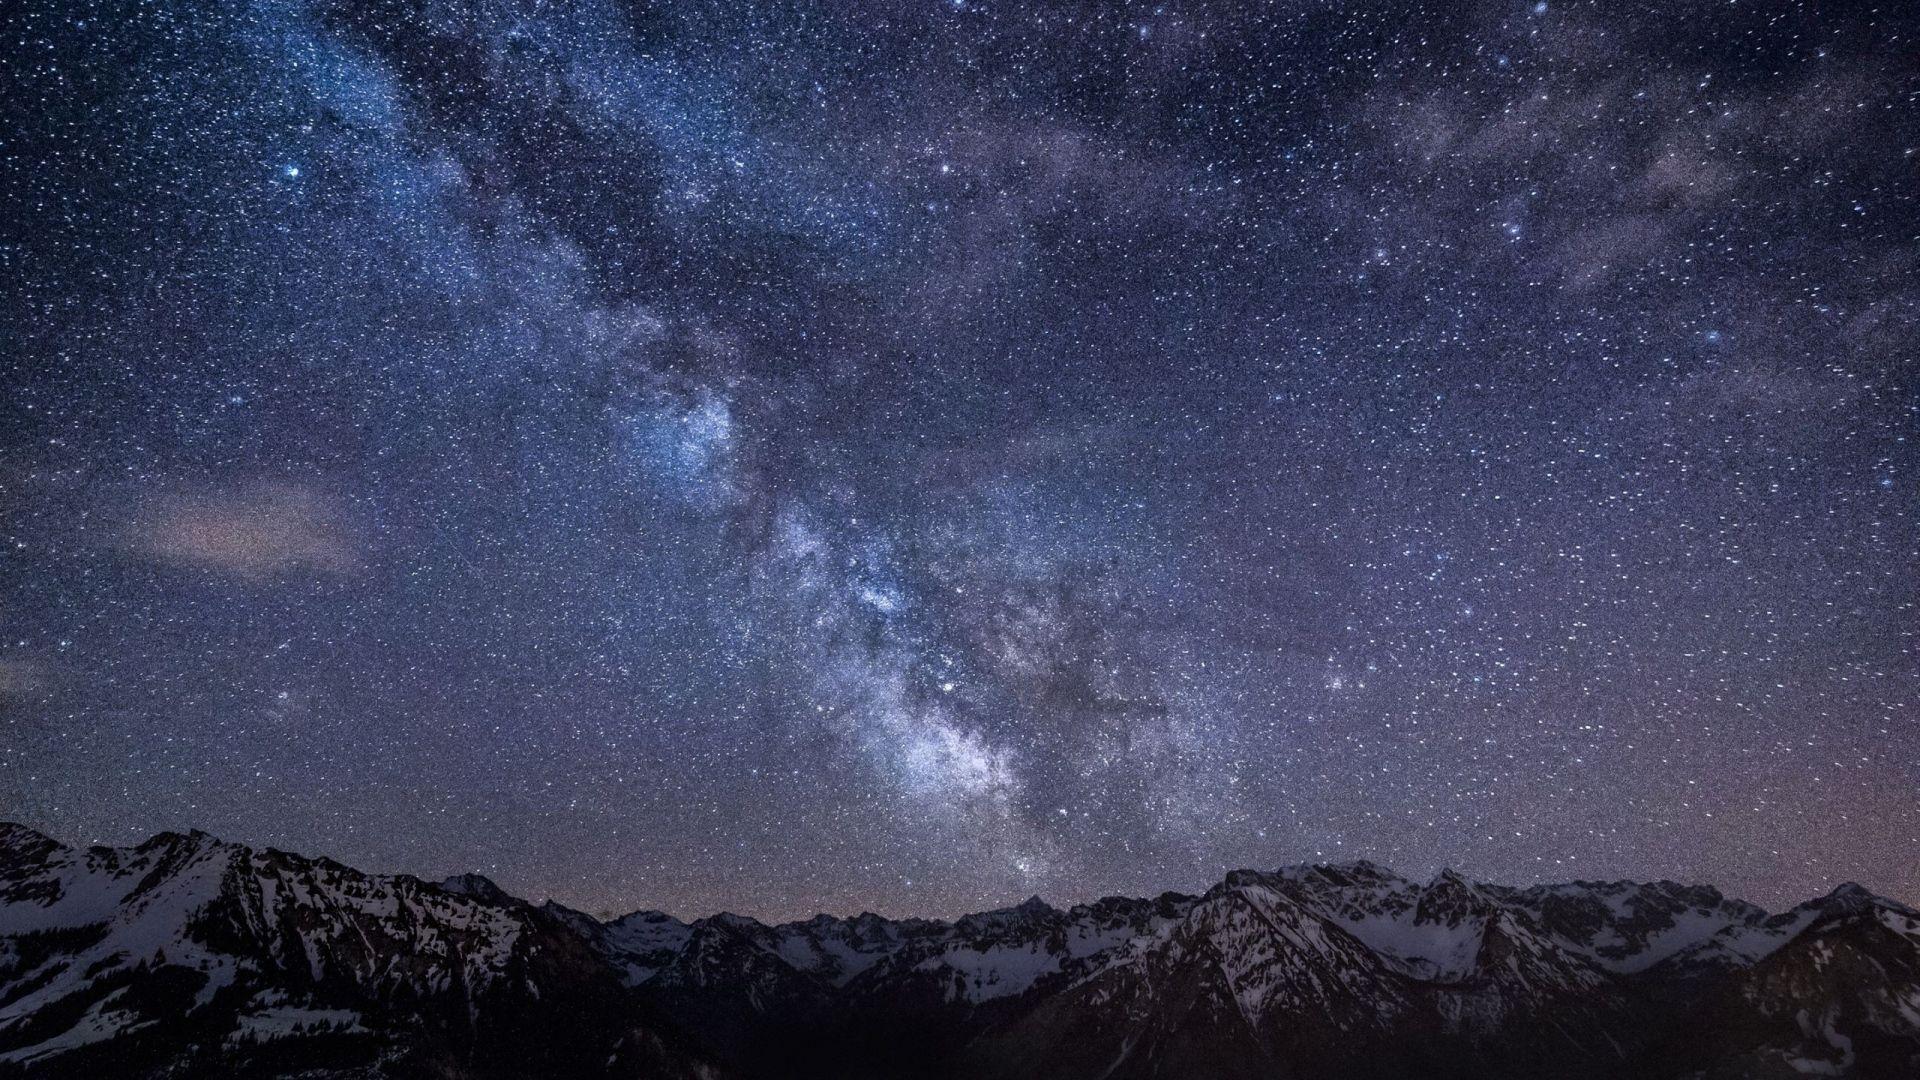 wallpaper a· 1920x1080 a· night sky